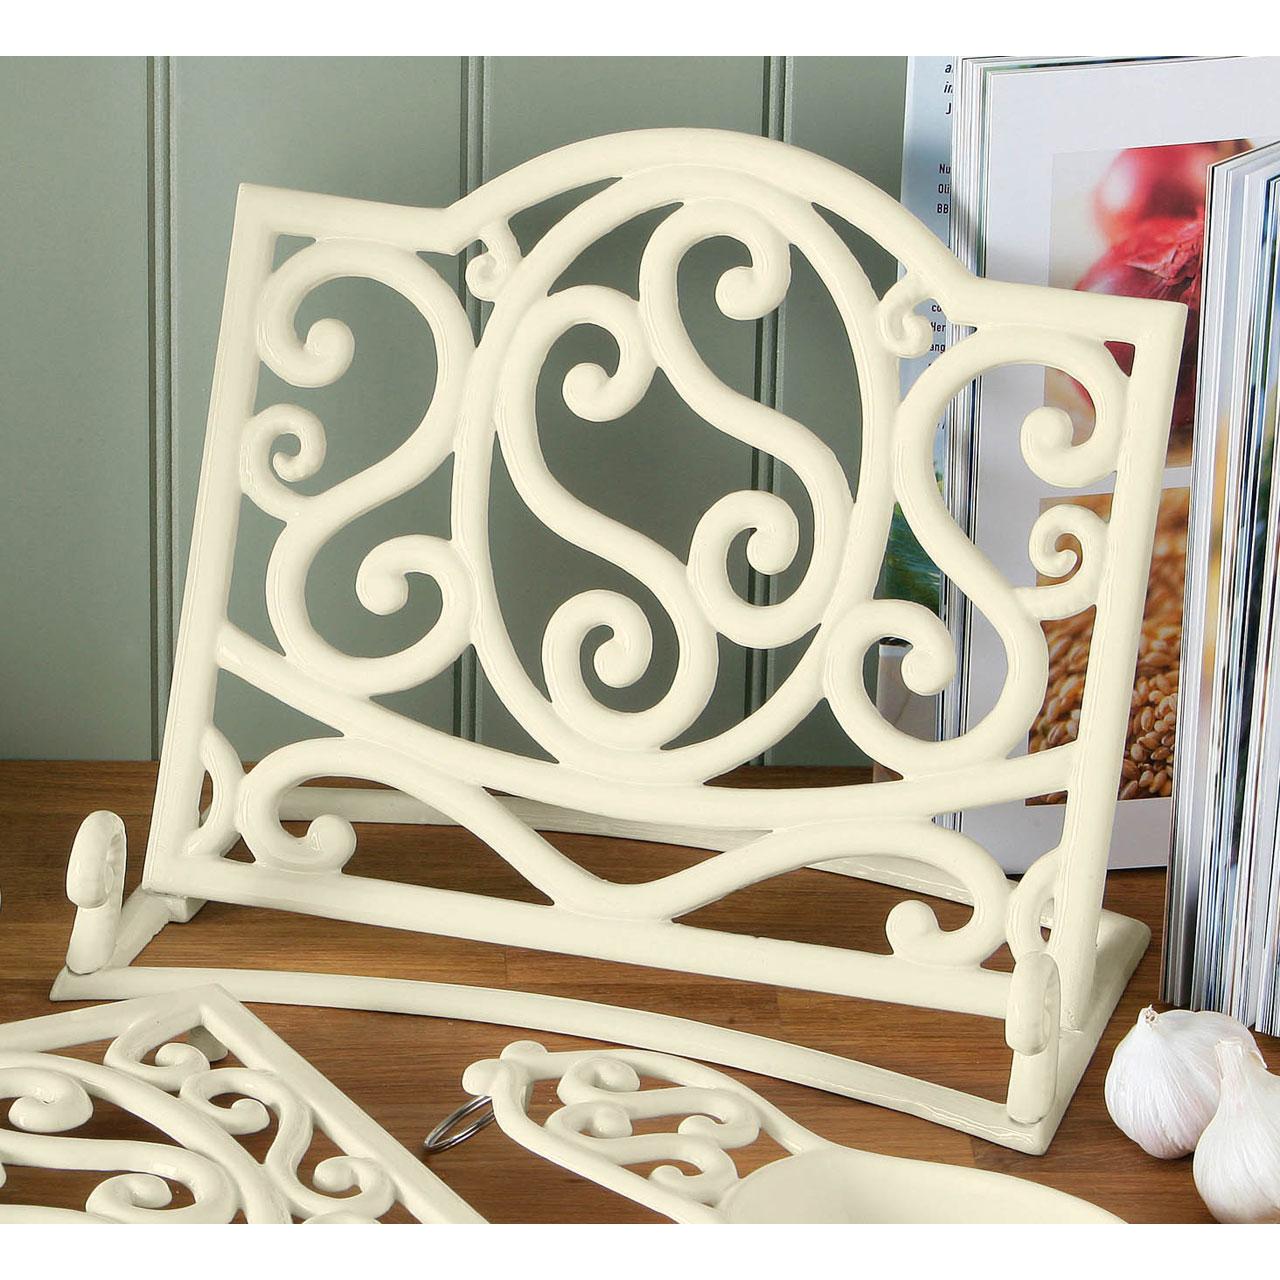 Cream cast iron trivet mug tree kitchen roll holder spoon rest cookbook stand ebay - Cream recipe book stand ...